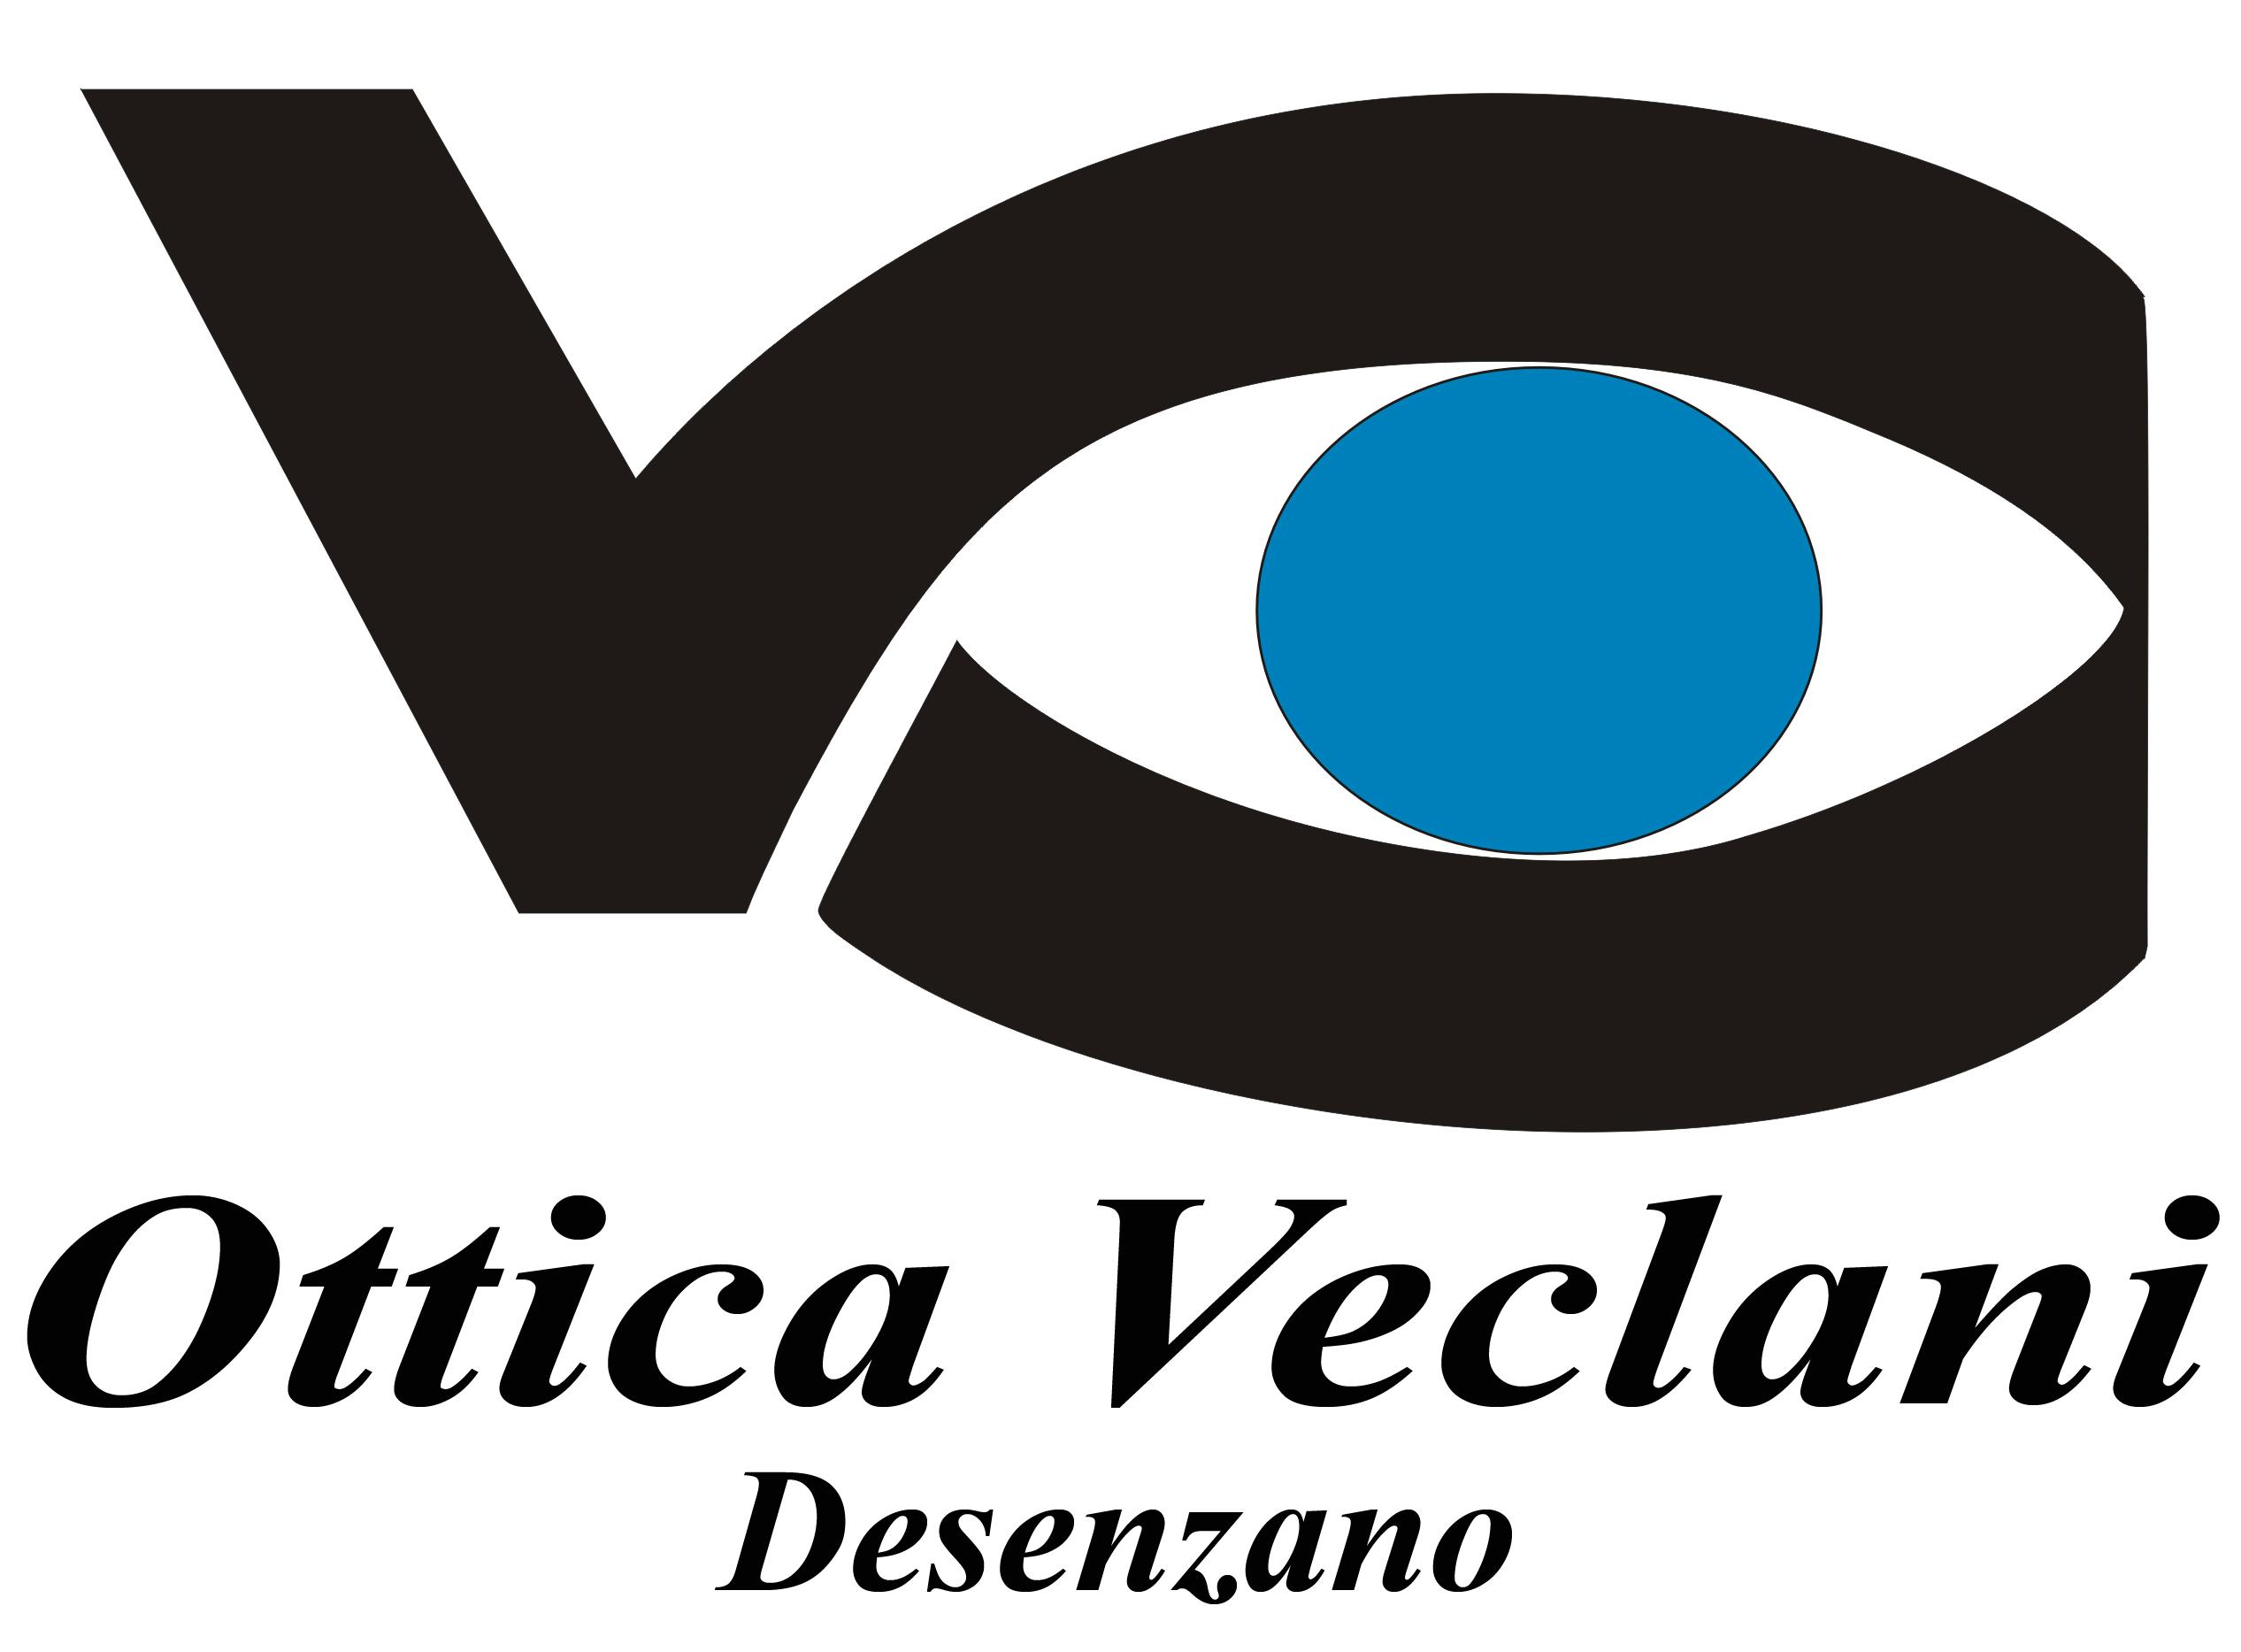 Logo-Veclani-Desenzano